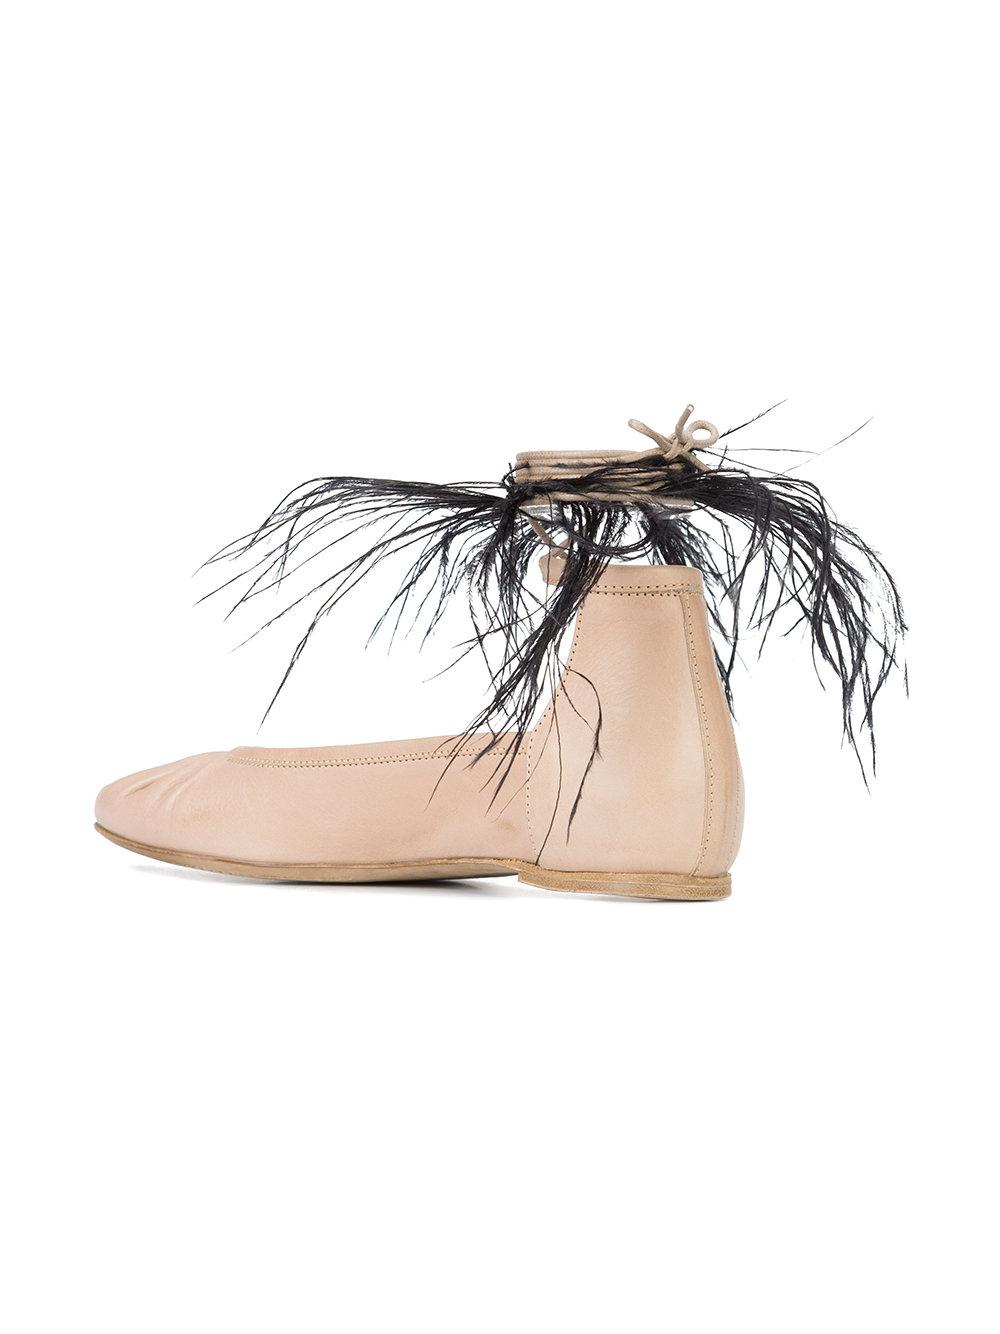 feather detail ballerinas - Nude & Neutrals Ann Demeulemeester DlqNe